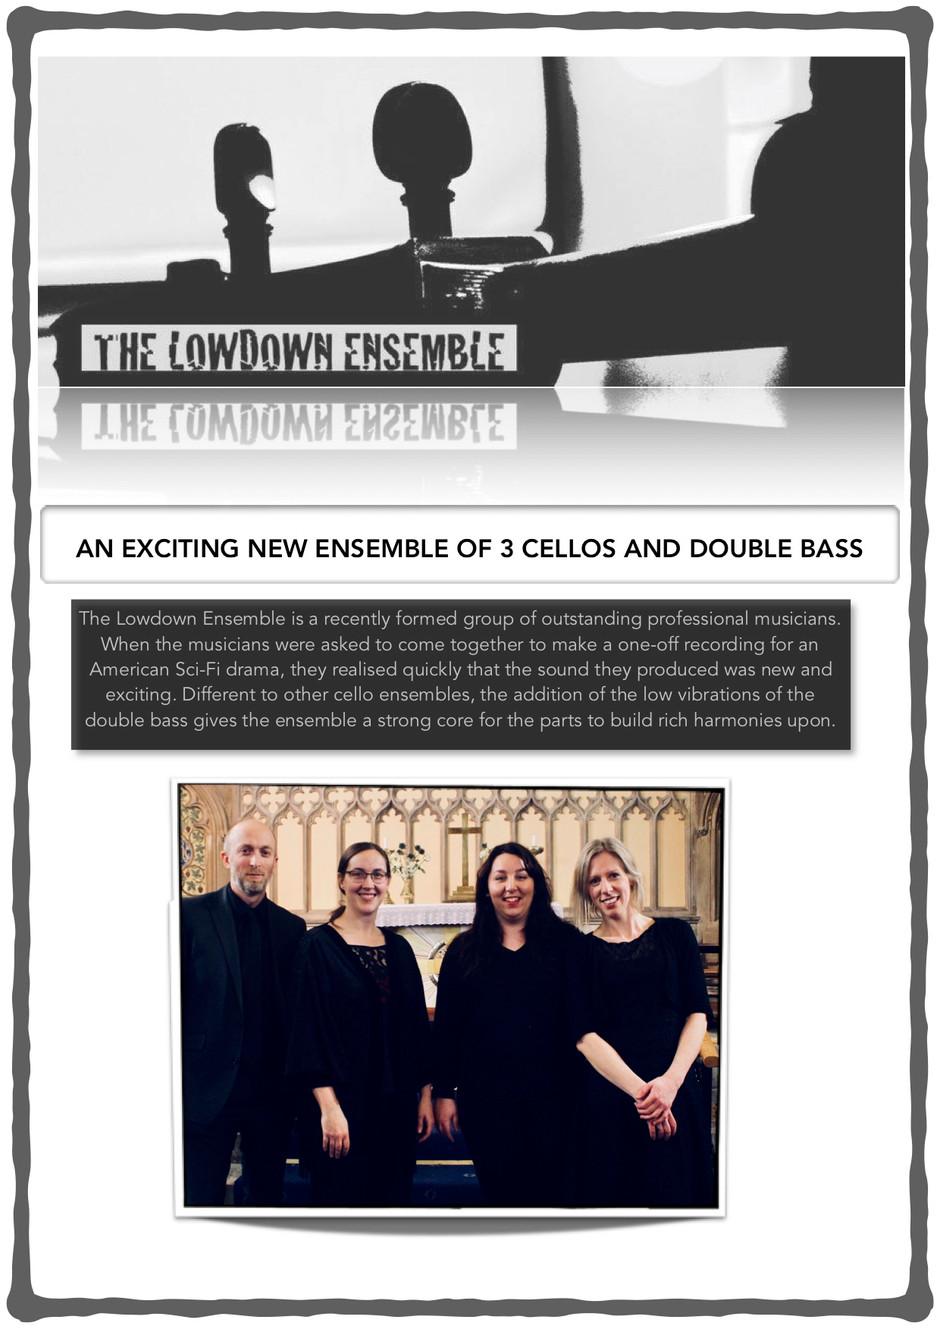 The Lowdown Ensemble takes flight!